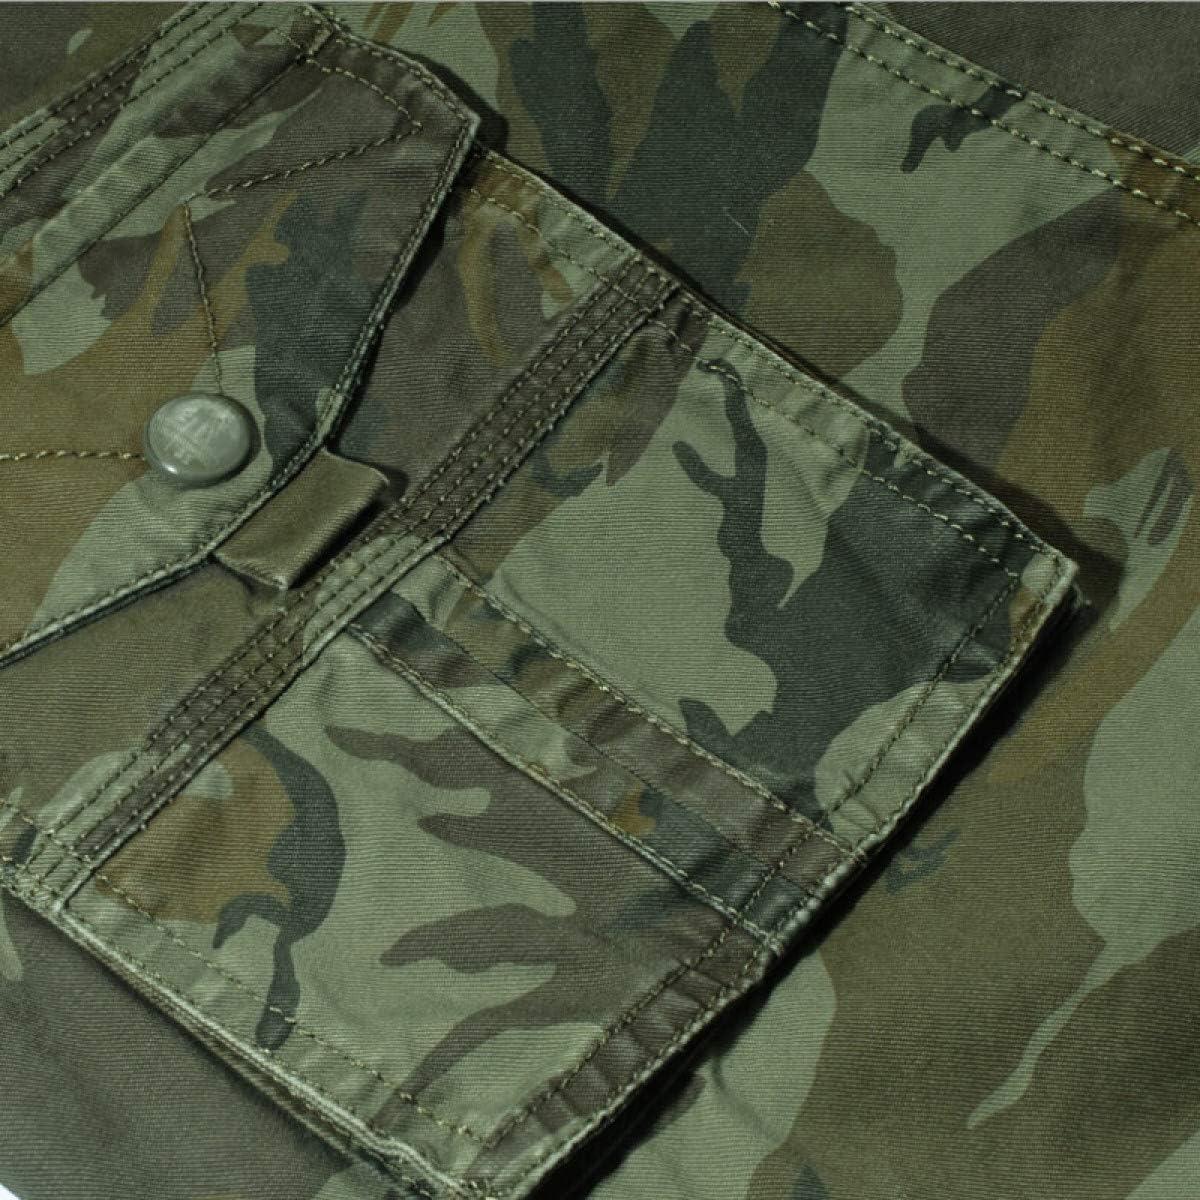 FLAMINGO/_STORE Cargo Shorts Mens Casual Shorts Male Loose Work Shorts Man Military Short Pants